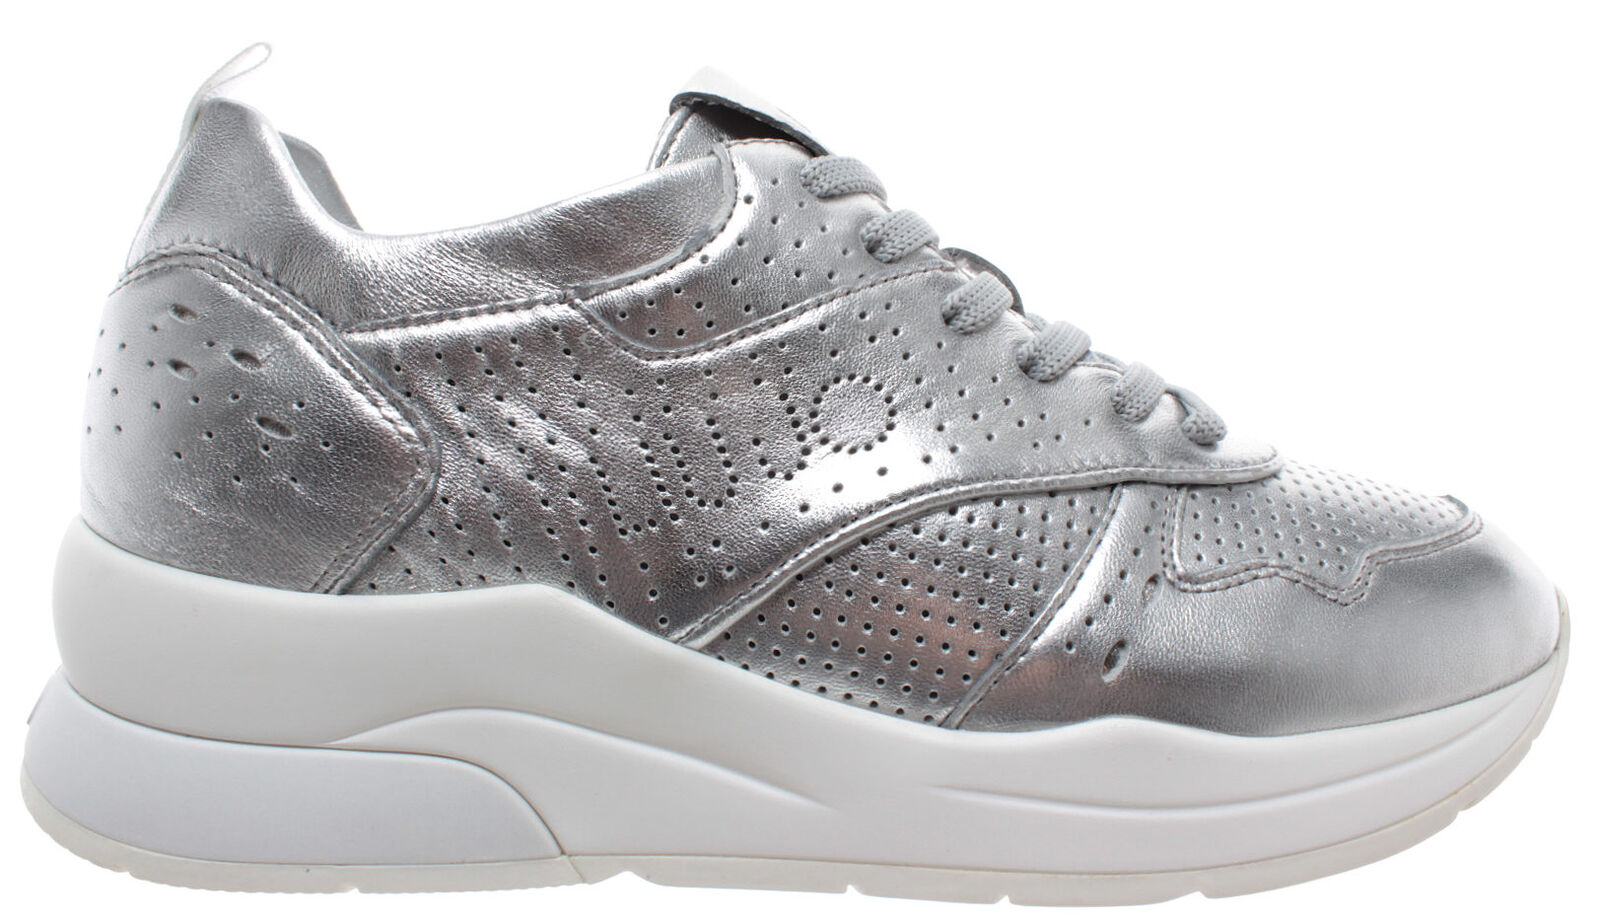 Liu jo  milano karlie 14 scarpe da ginnastica pelle metallica argentoo donne scarpe nove nuove  negozio outlet